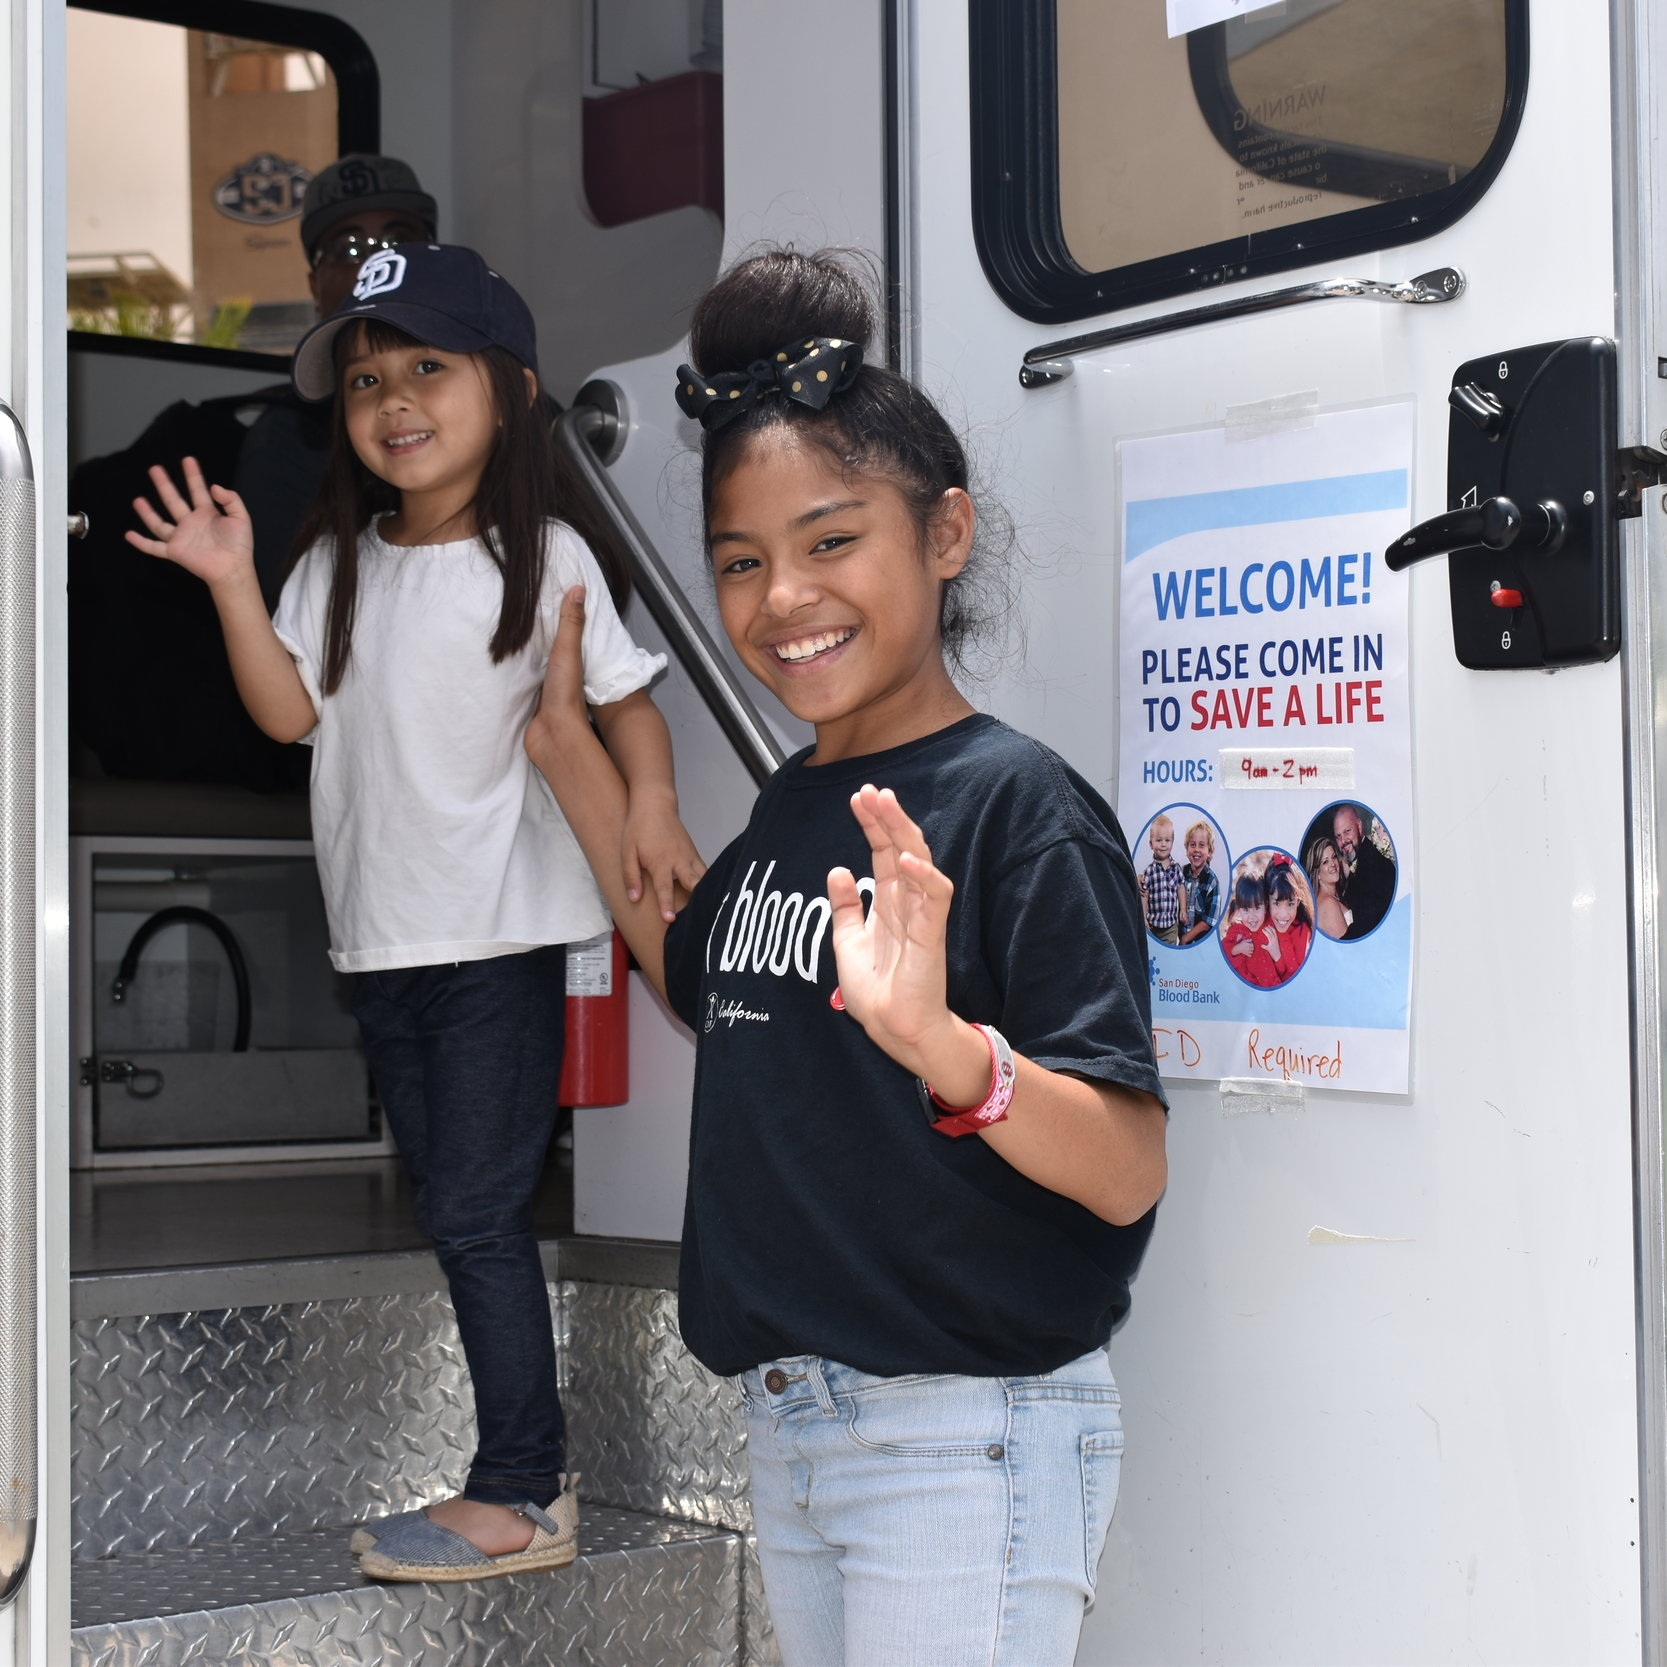 Kamila and Ella board a Bloodmobile full of smiles and gratitude.